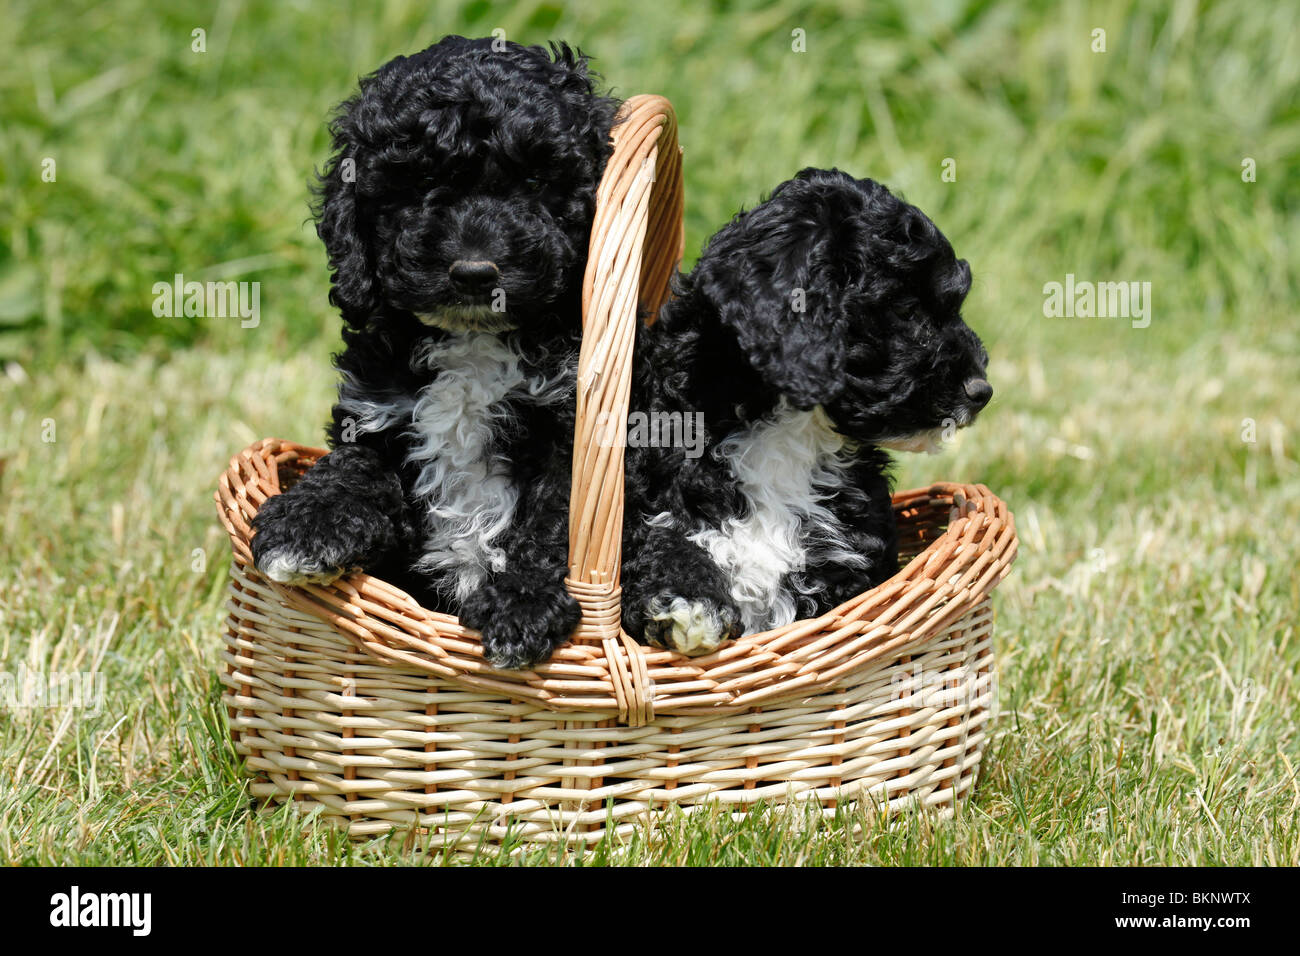 Cockapoo Welpen / Cockapoo Puppies - Stock Image